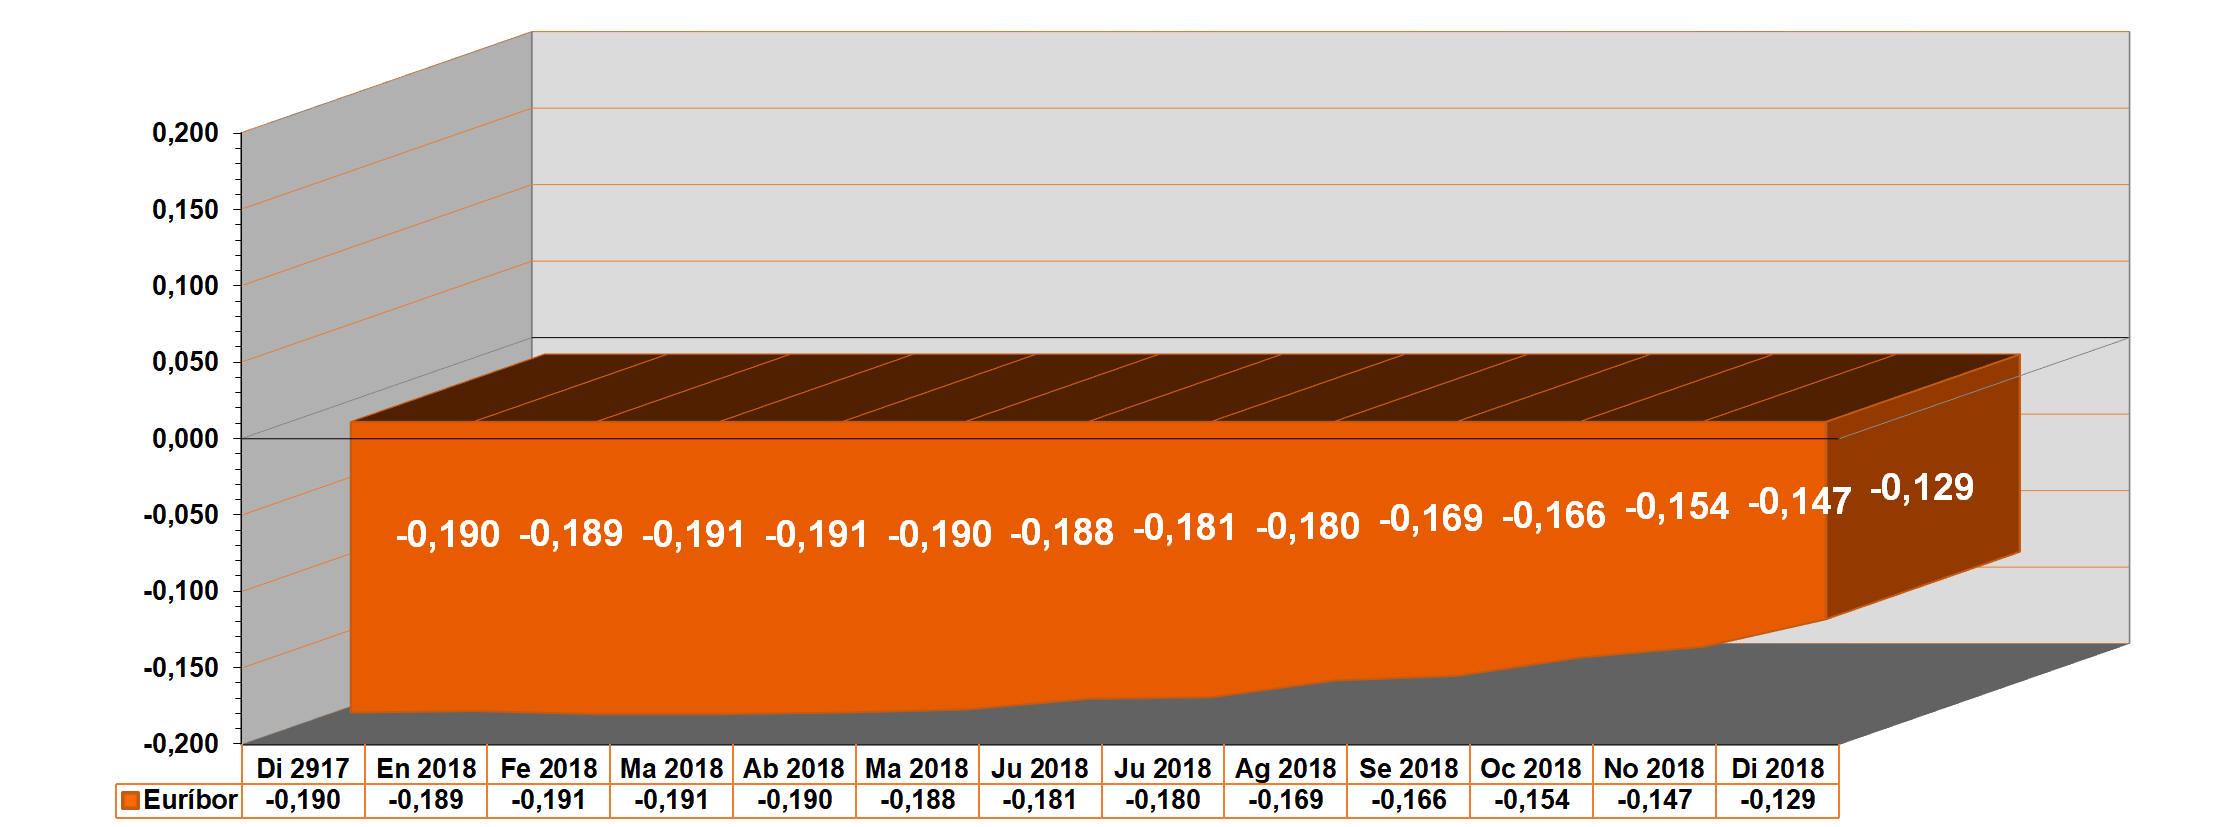 Gráfico Euribor actual desde diciembre 2017 hasta diciembre 2018